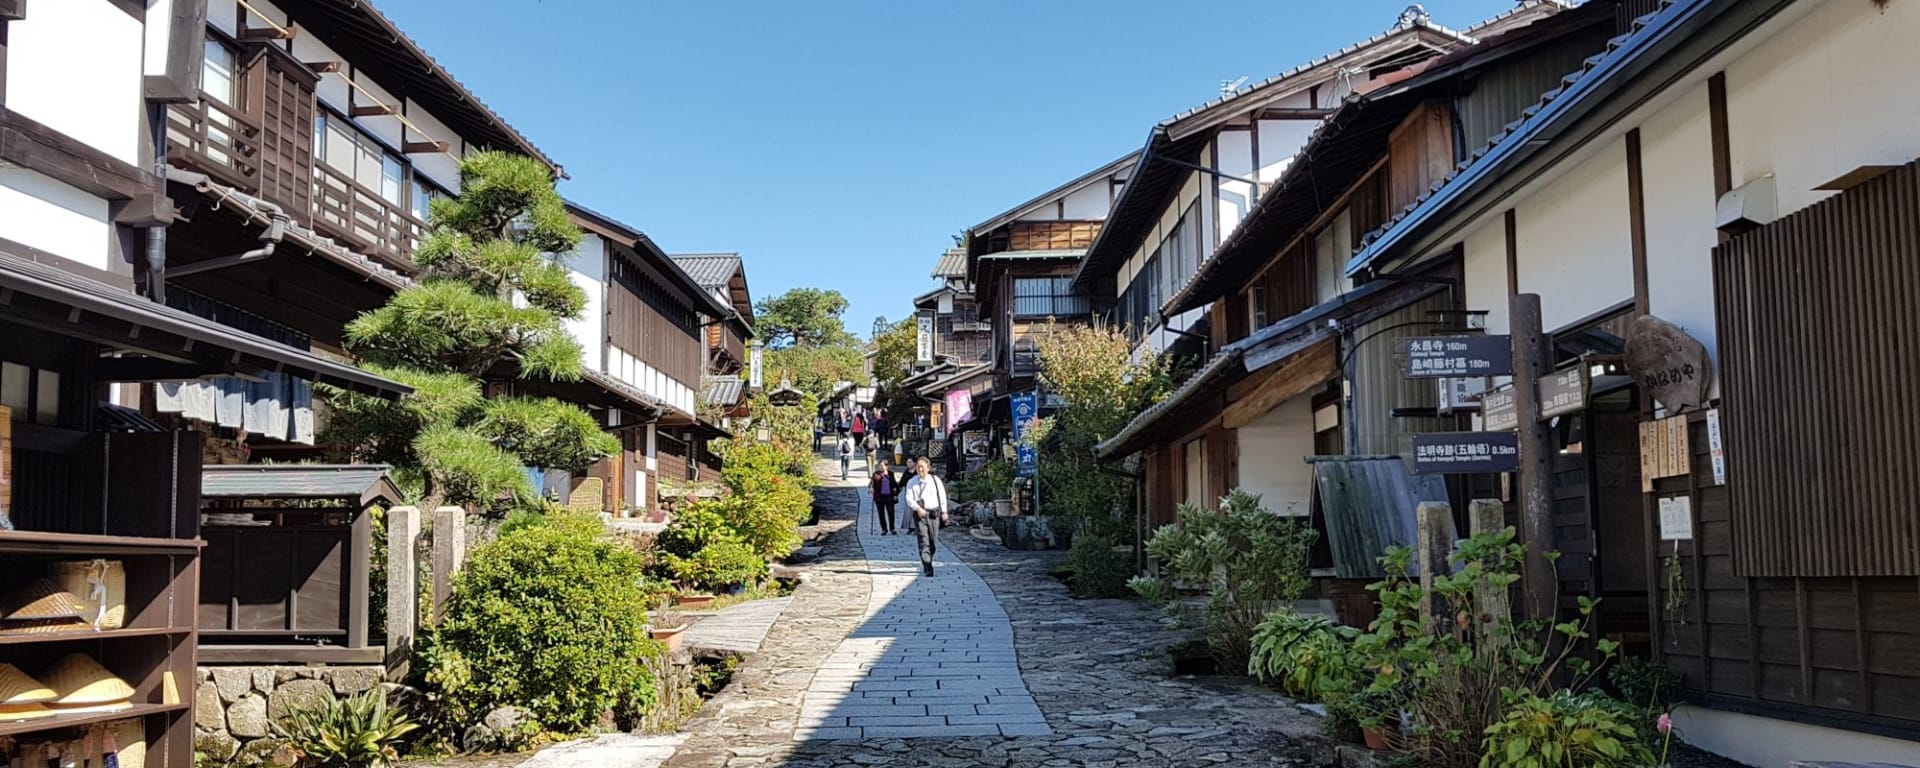 Vielfältiges Japan ab Tokio: Kiso Valley - Nakasendo Trail - Magome Village